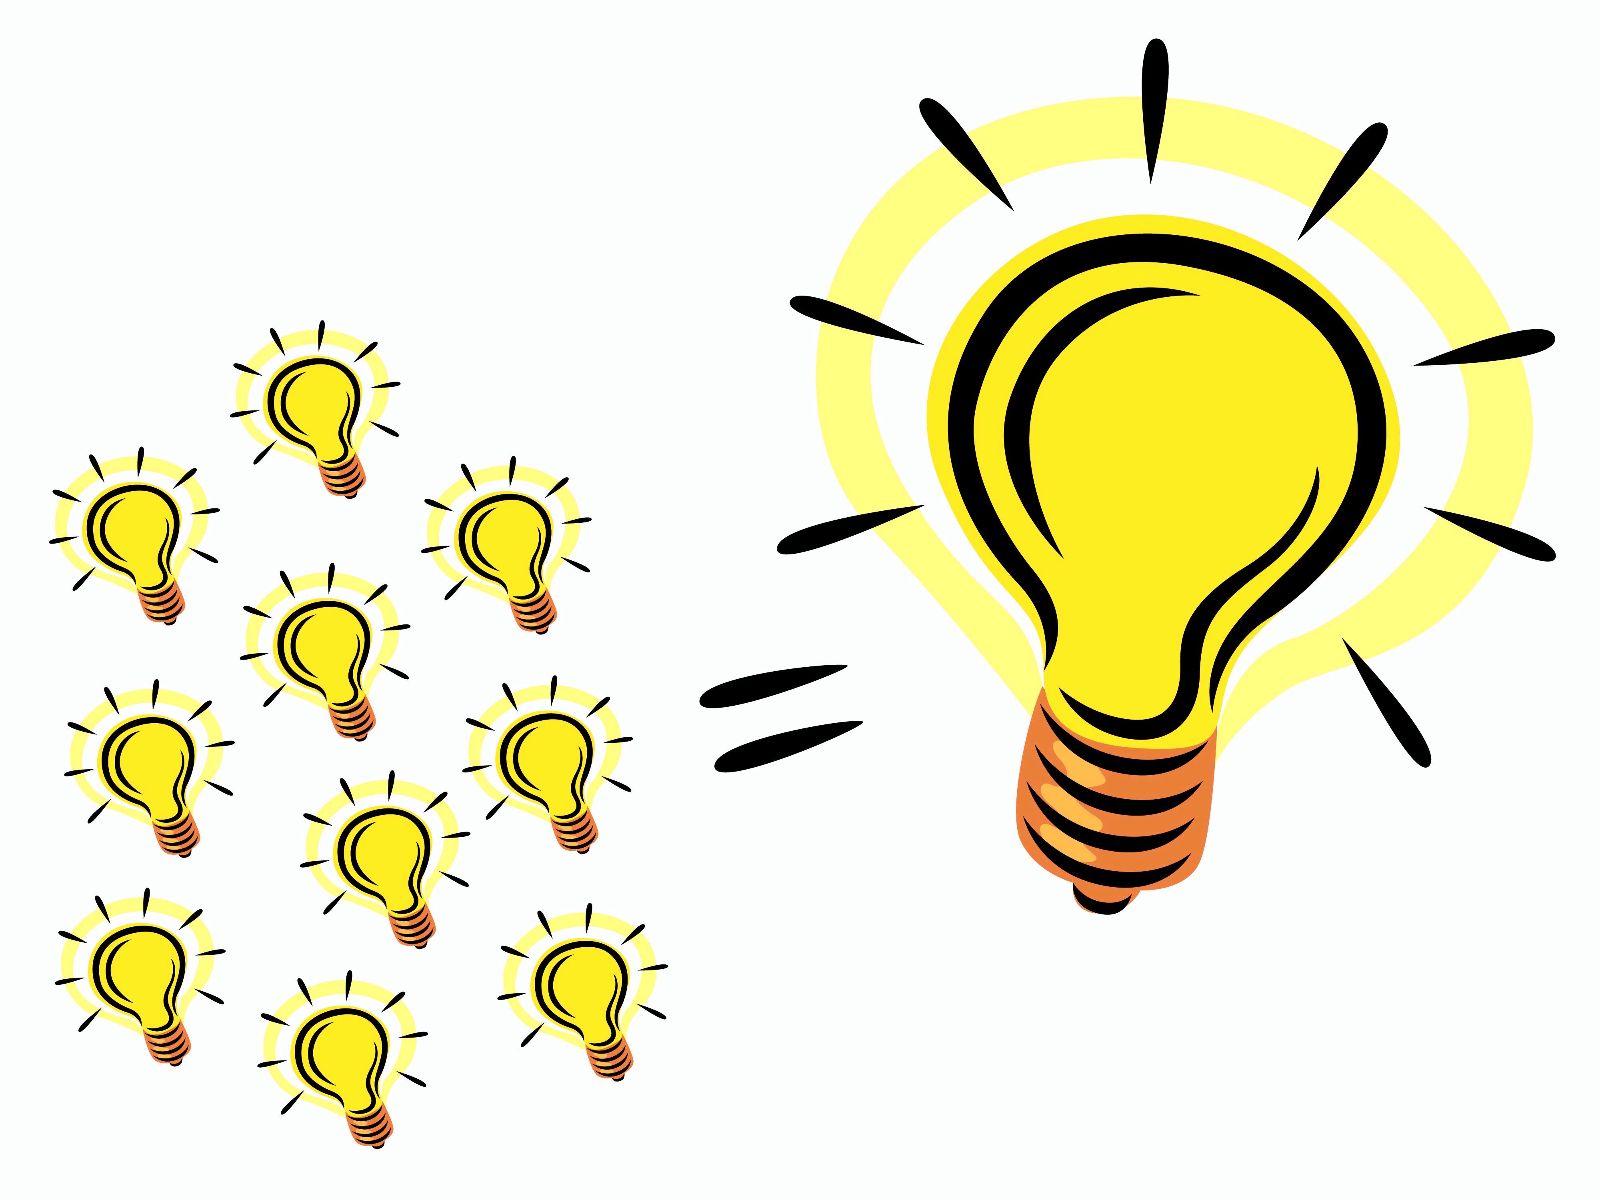 Bright Idea Light Bulb Clip Art N5 free image.